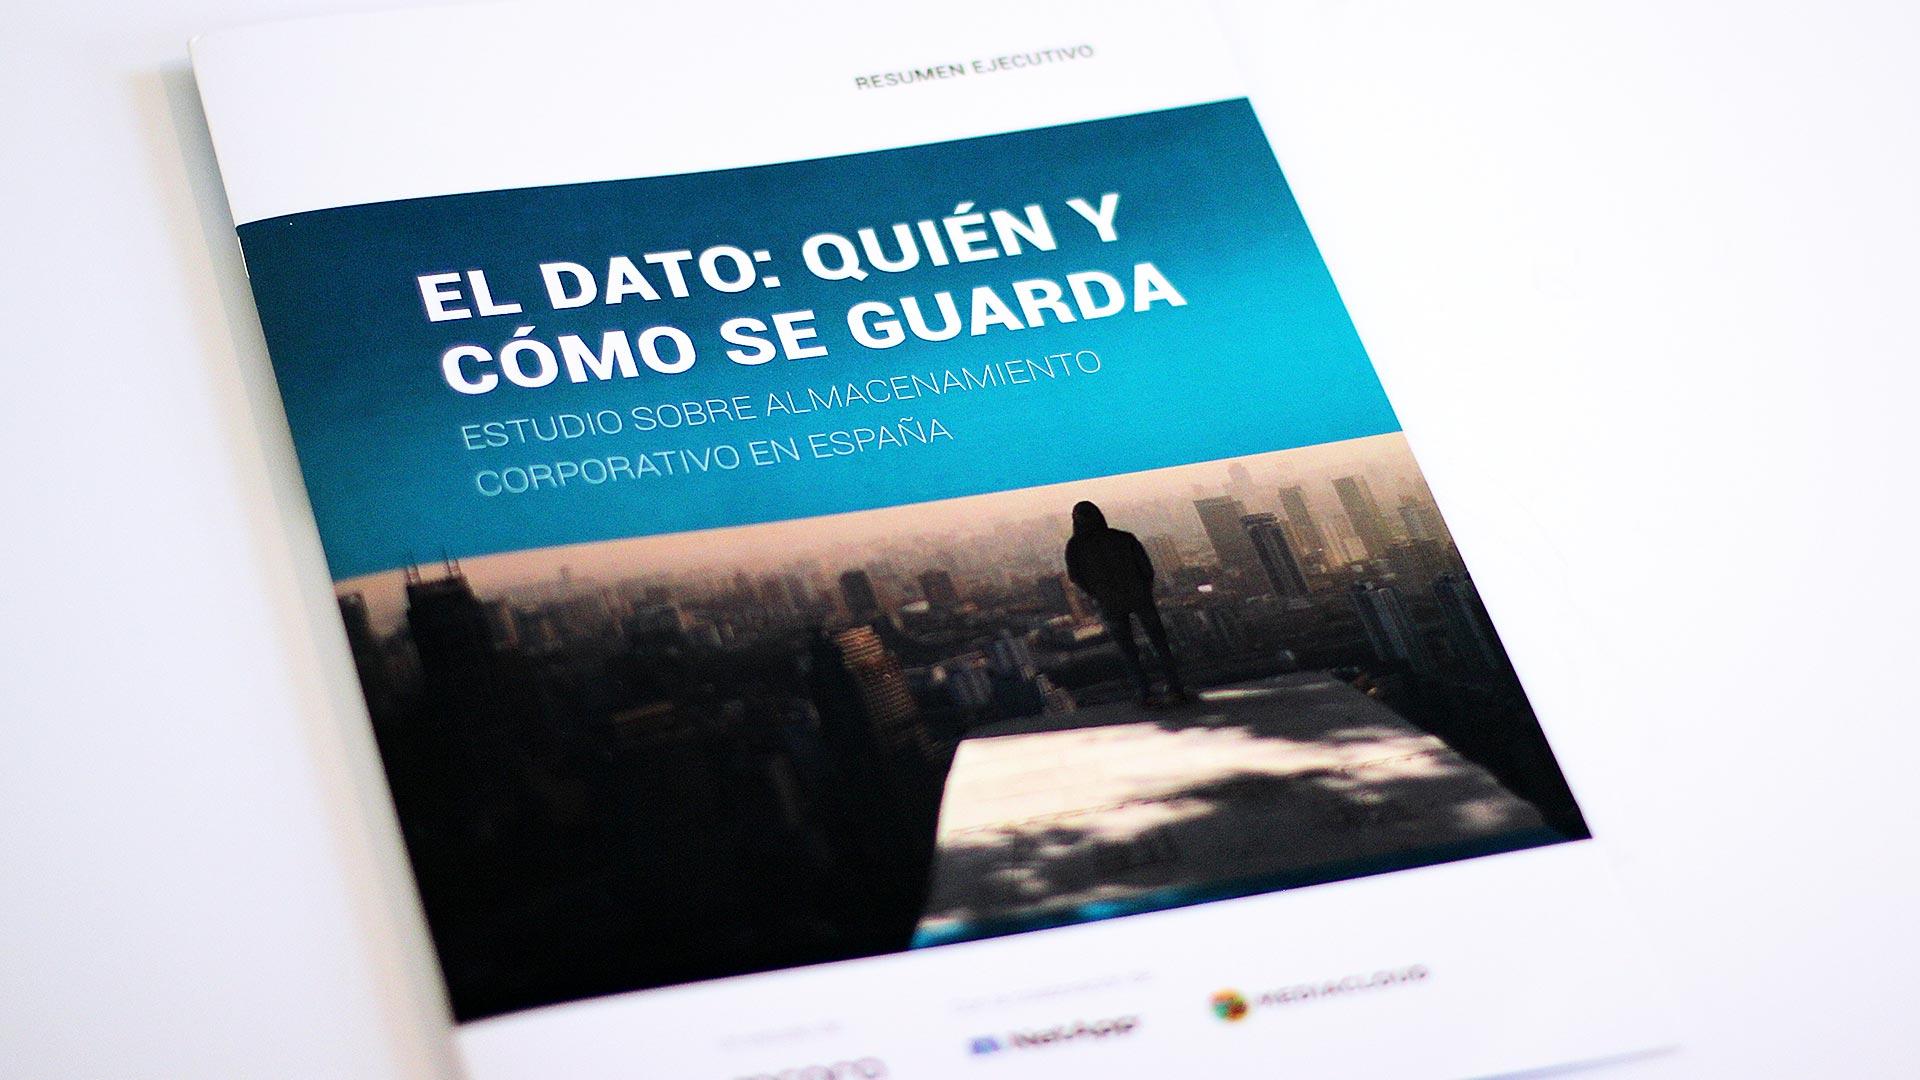 netapp-mediacloud-content-marketing-informe-resumen-ejecutivo-ebook-2017-09